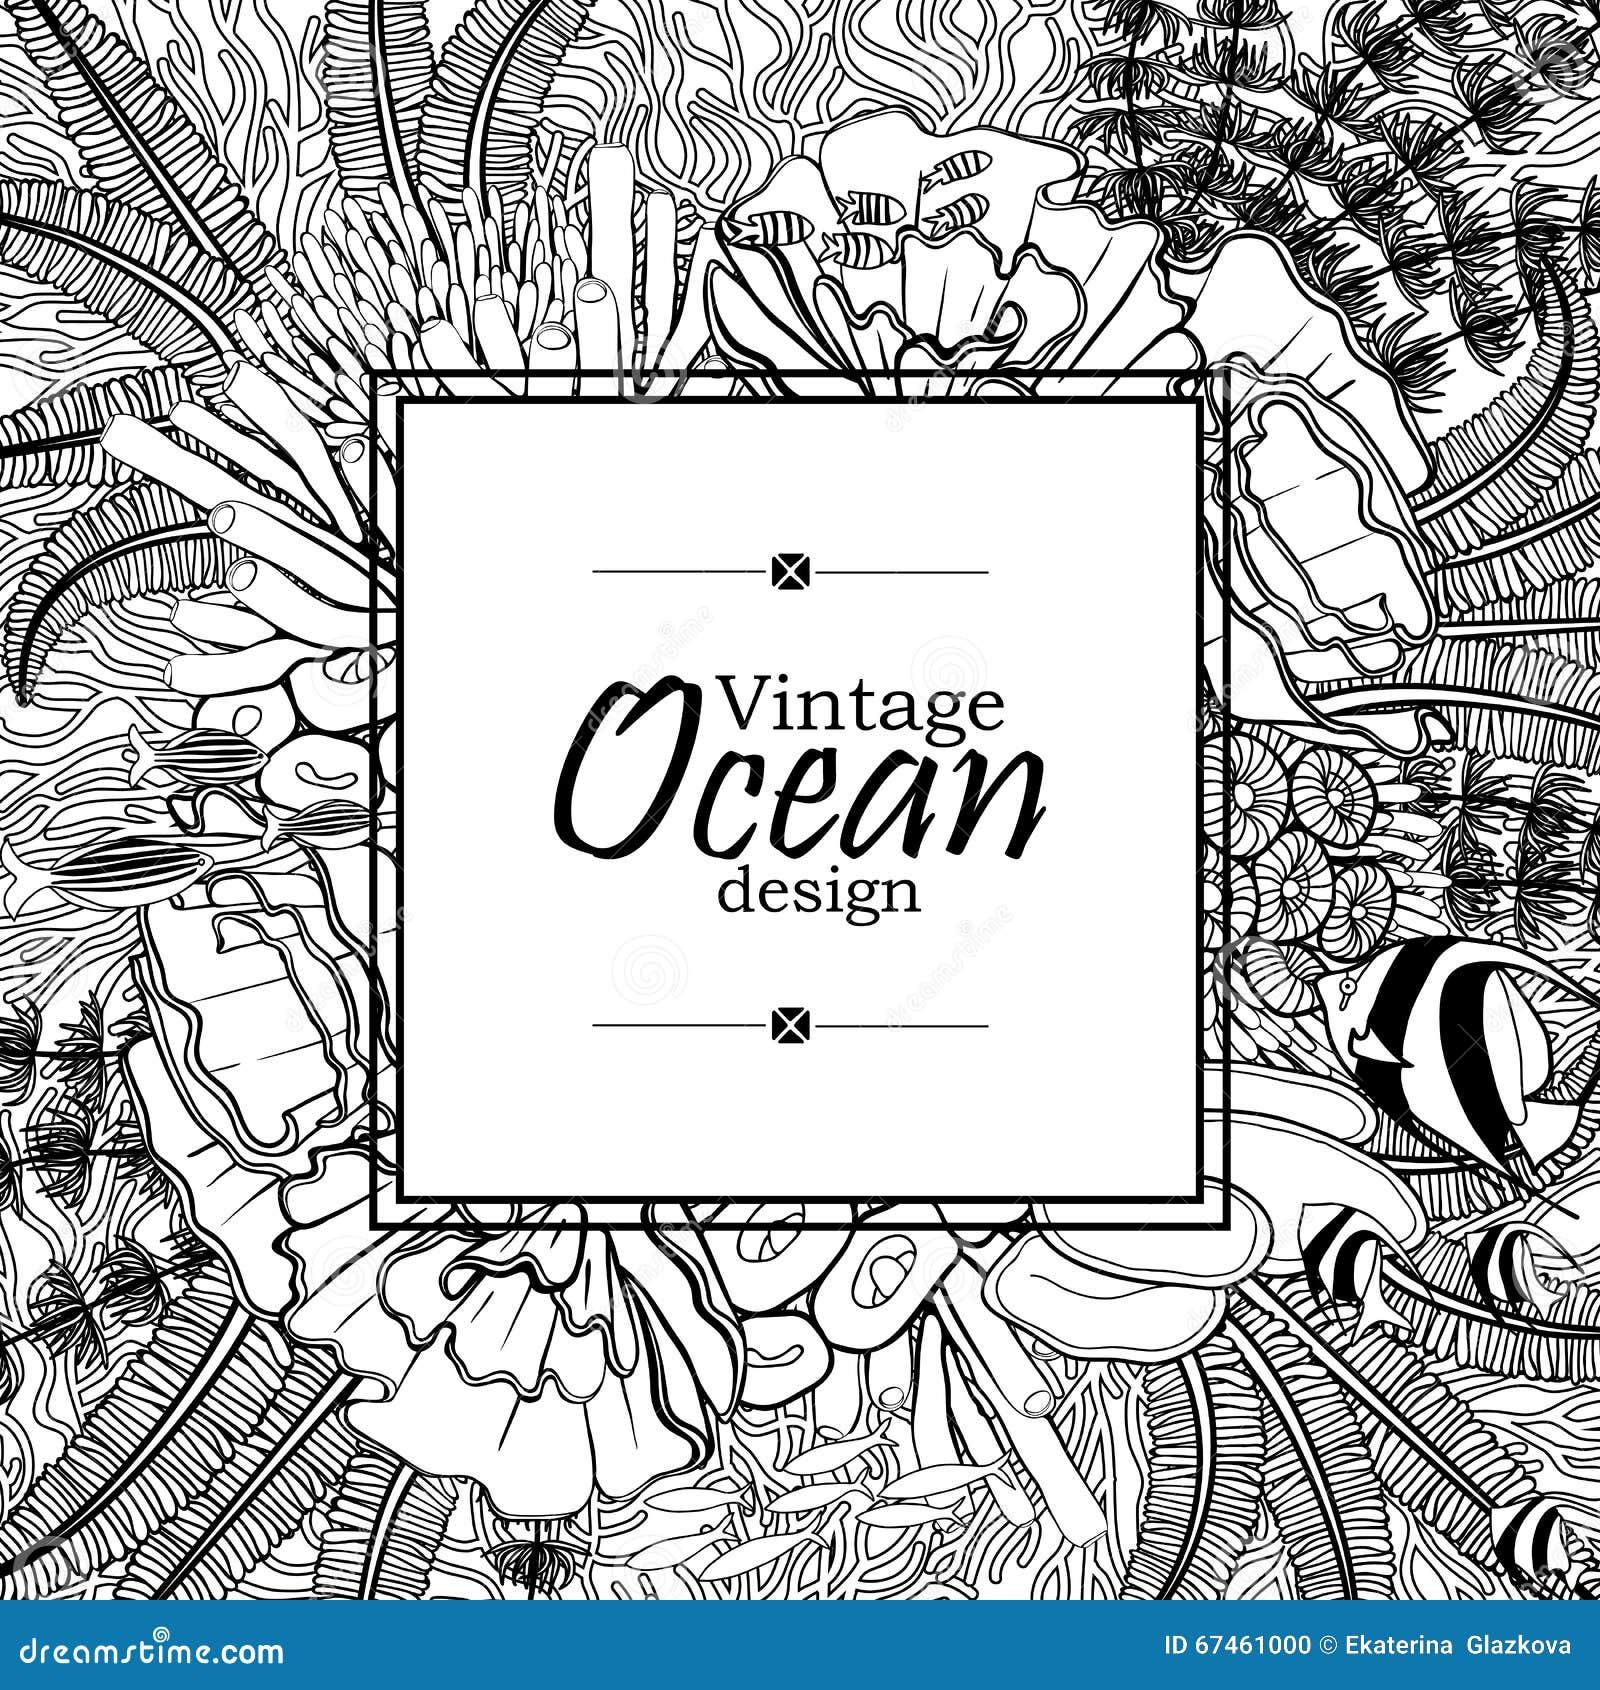 Ocean Line Art Design Royalty Free Illustration